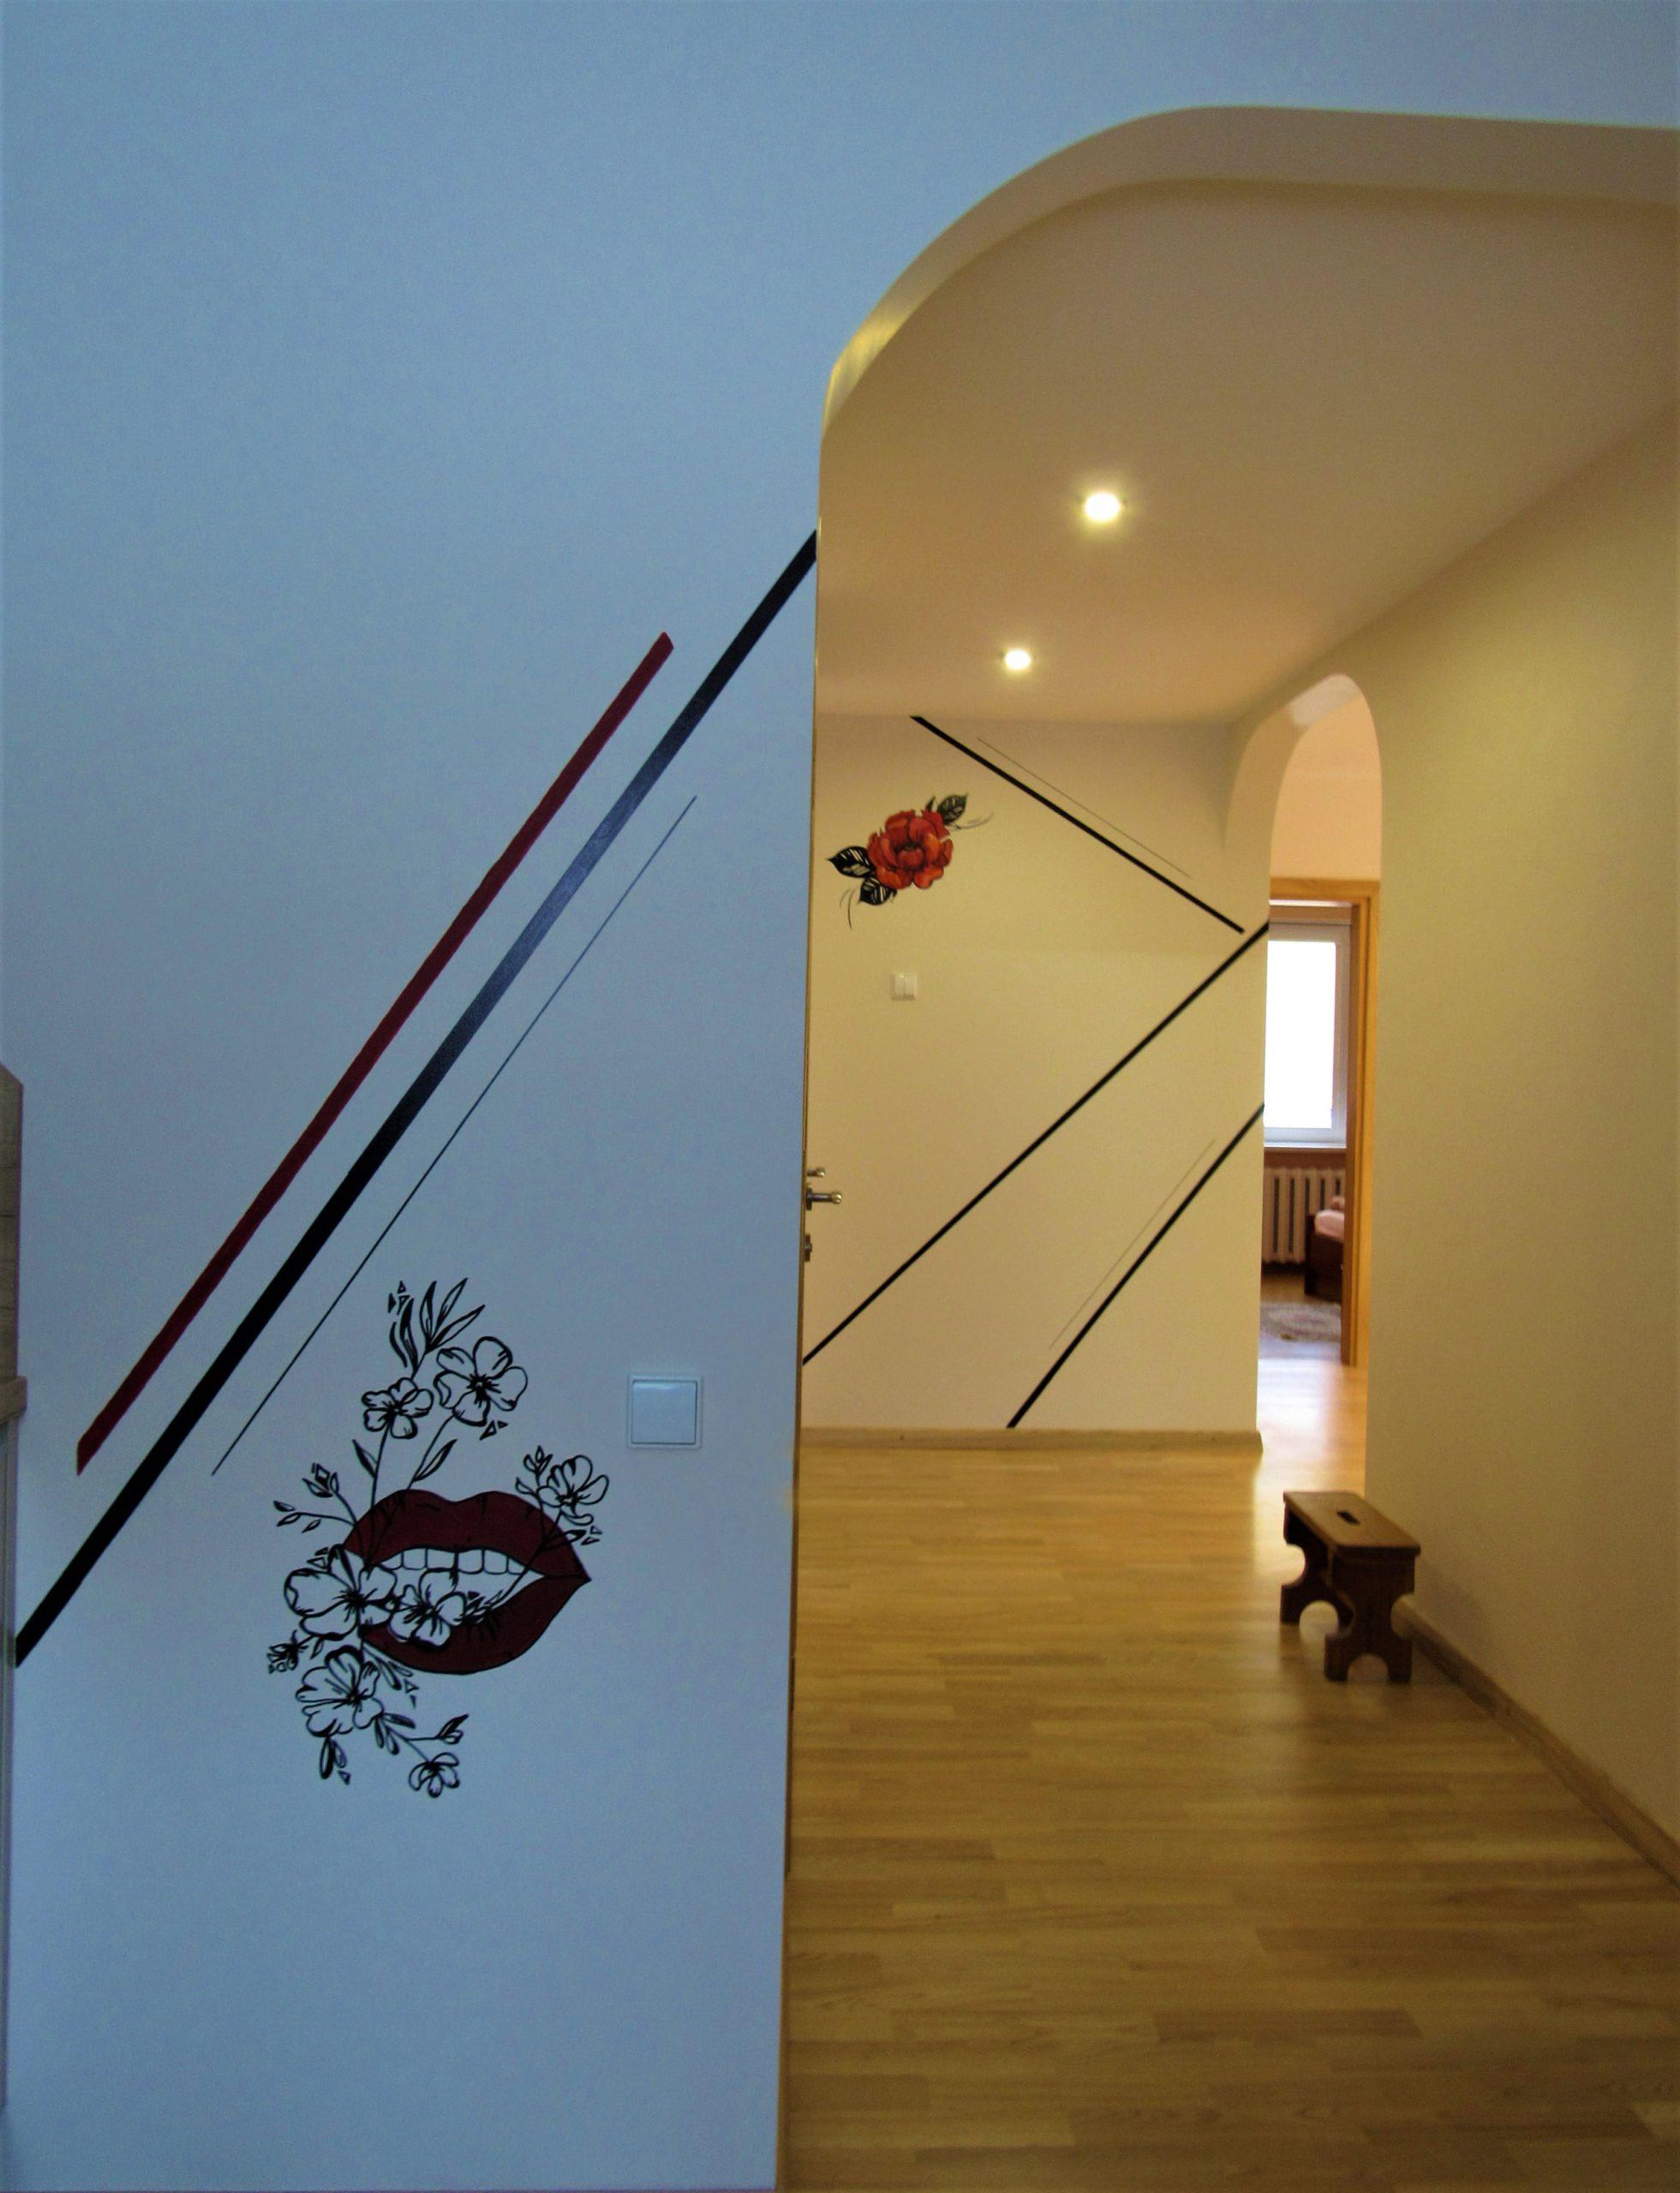 menine-kuryba-sienu-dekoravimas-ivairus-interjerai (13)